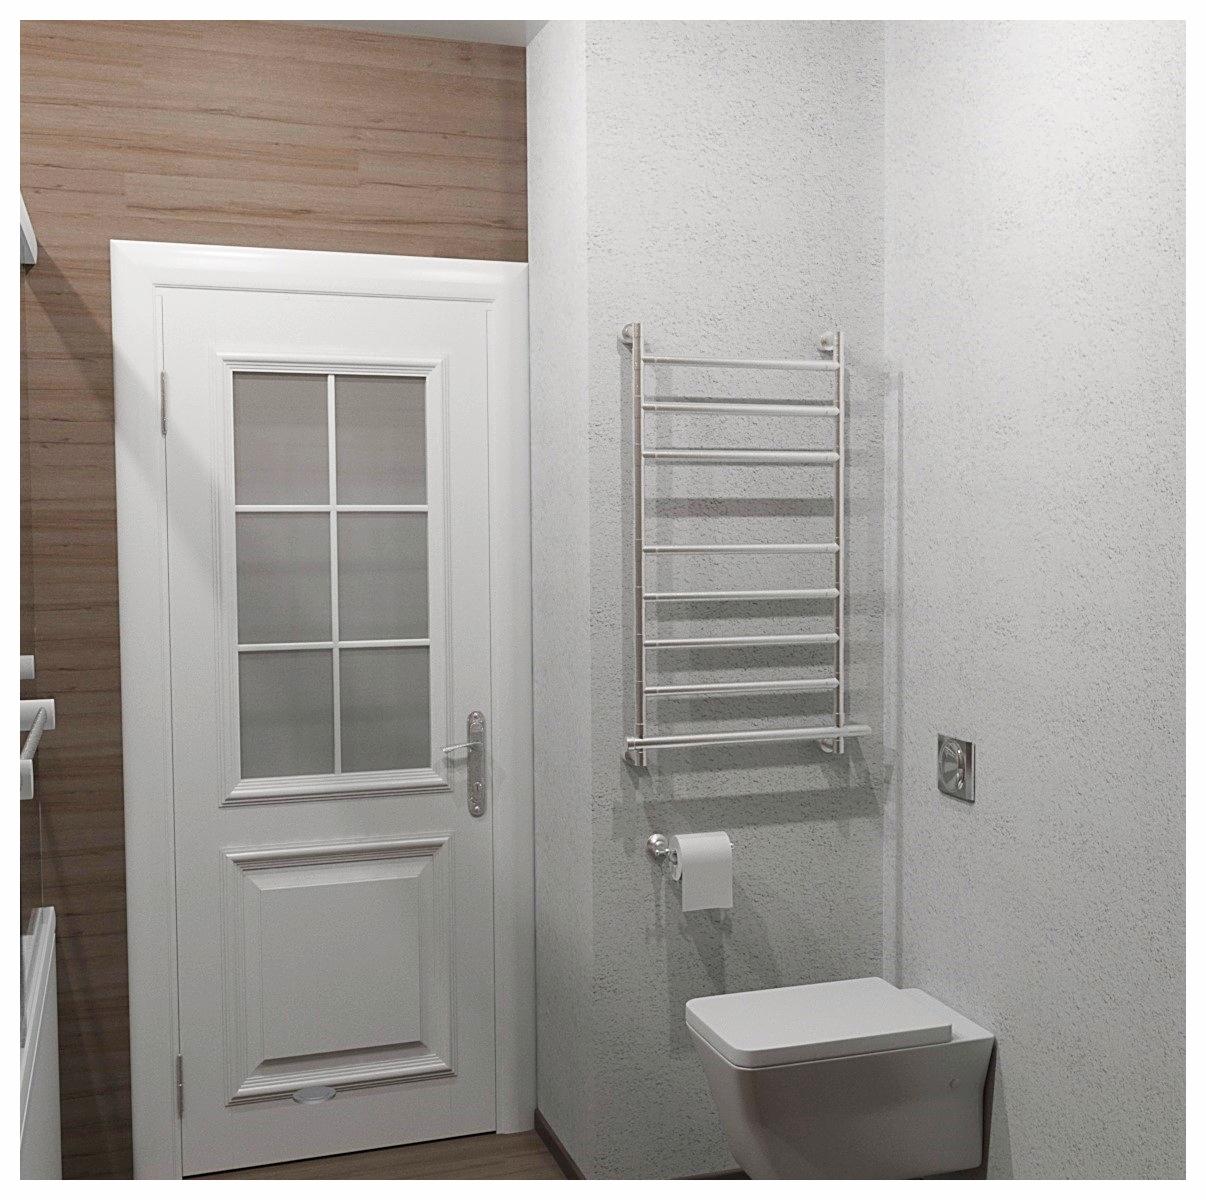 Дизайн интерьеров двухкомнатной квартиры. Санузел 2.